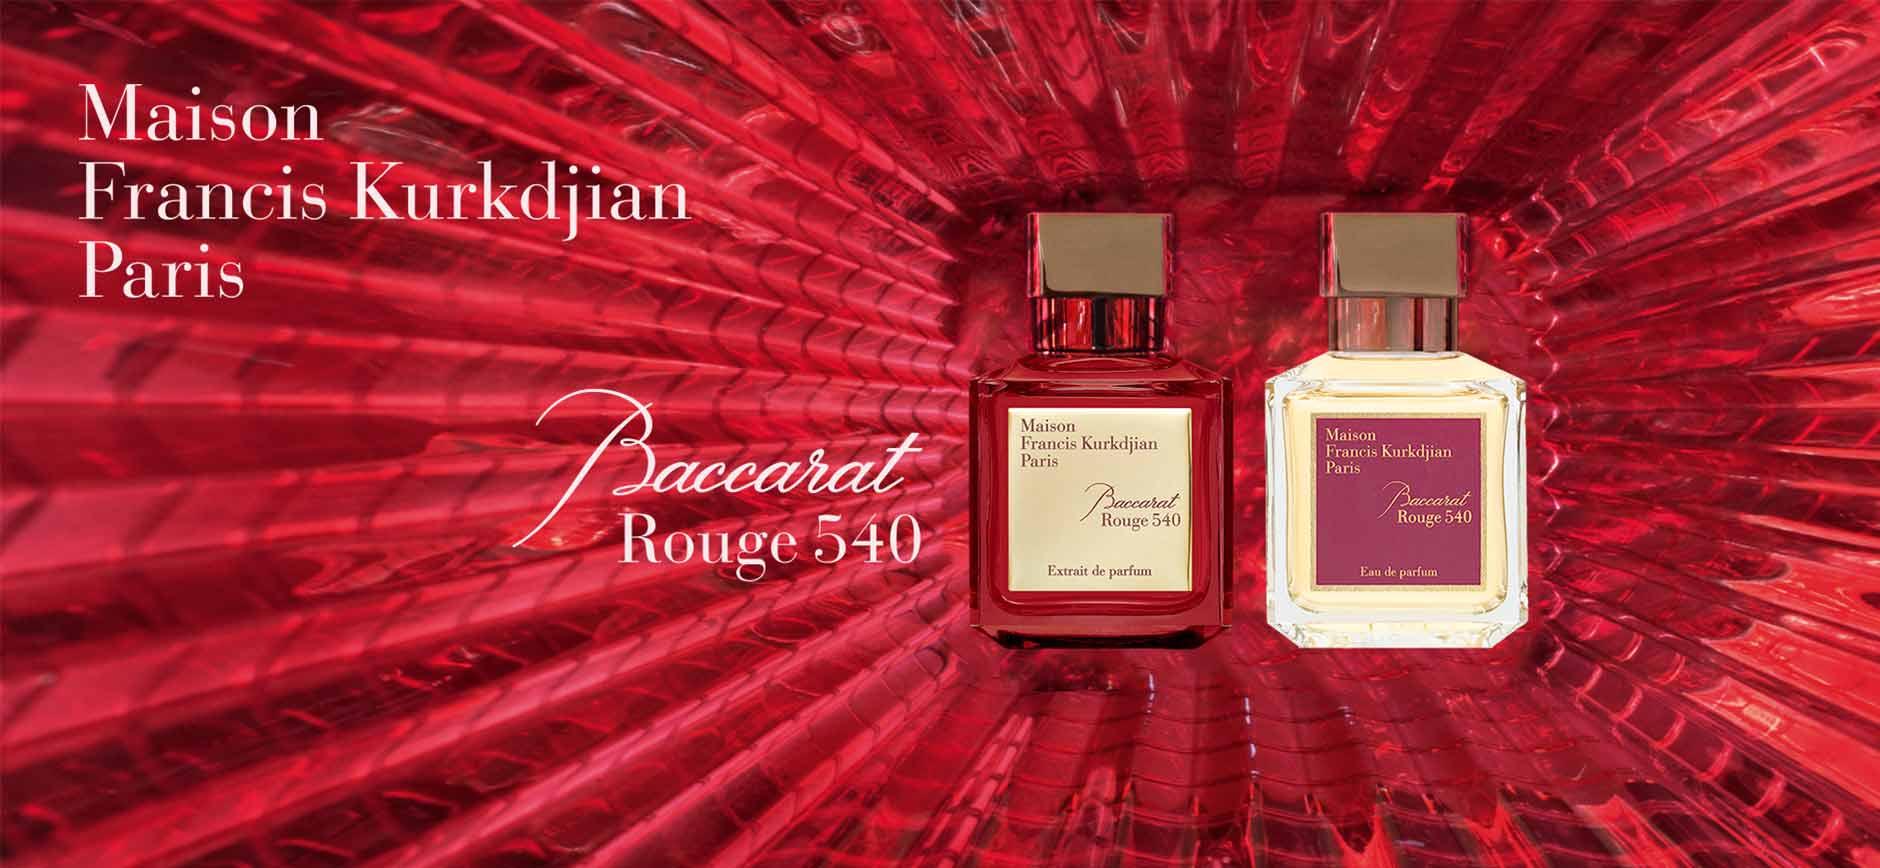 mfk baccarat 540 edp ve extrait de parfum kristaller commercial poster.jpg